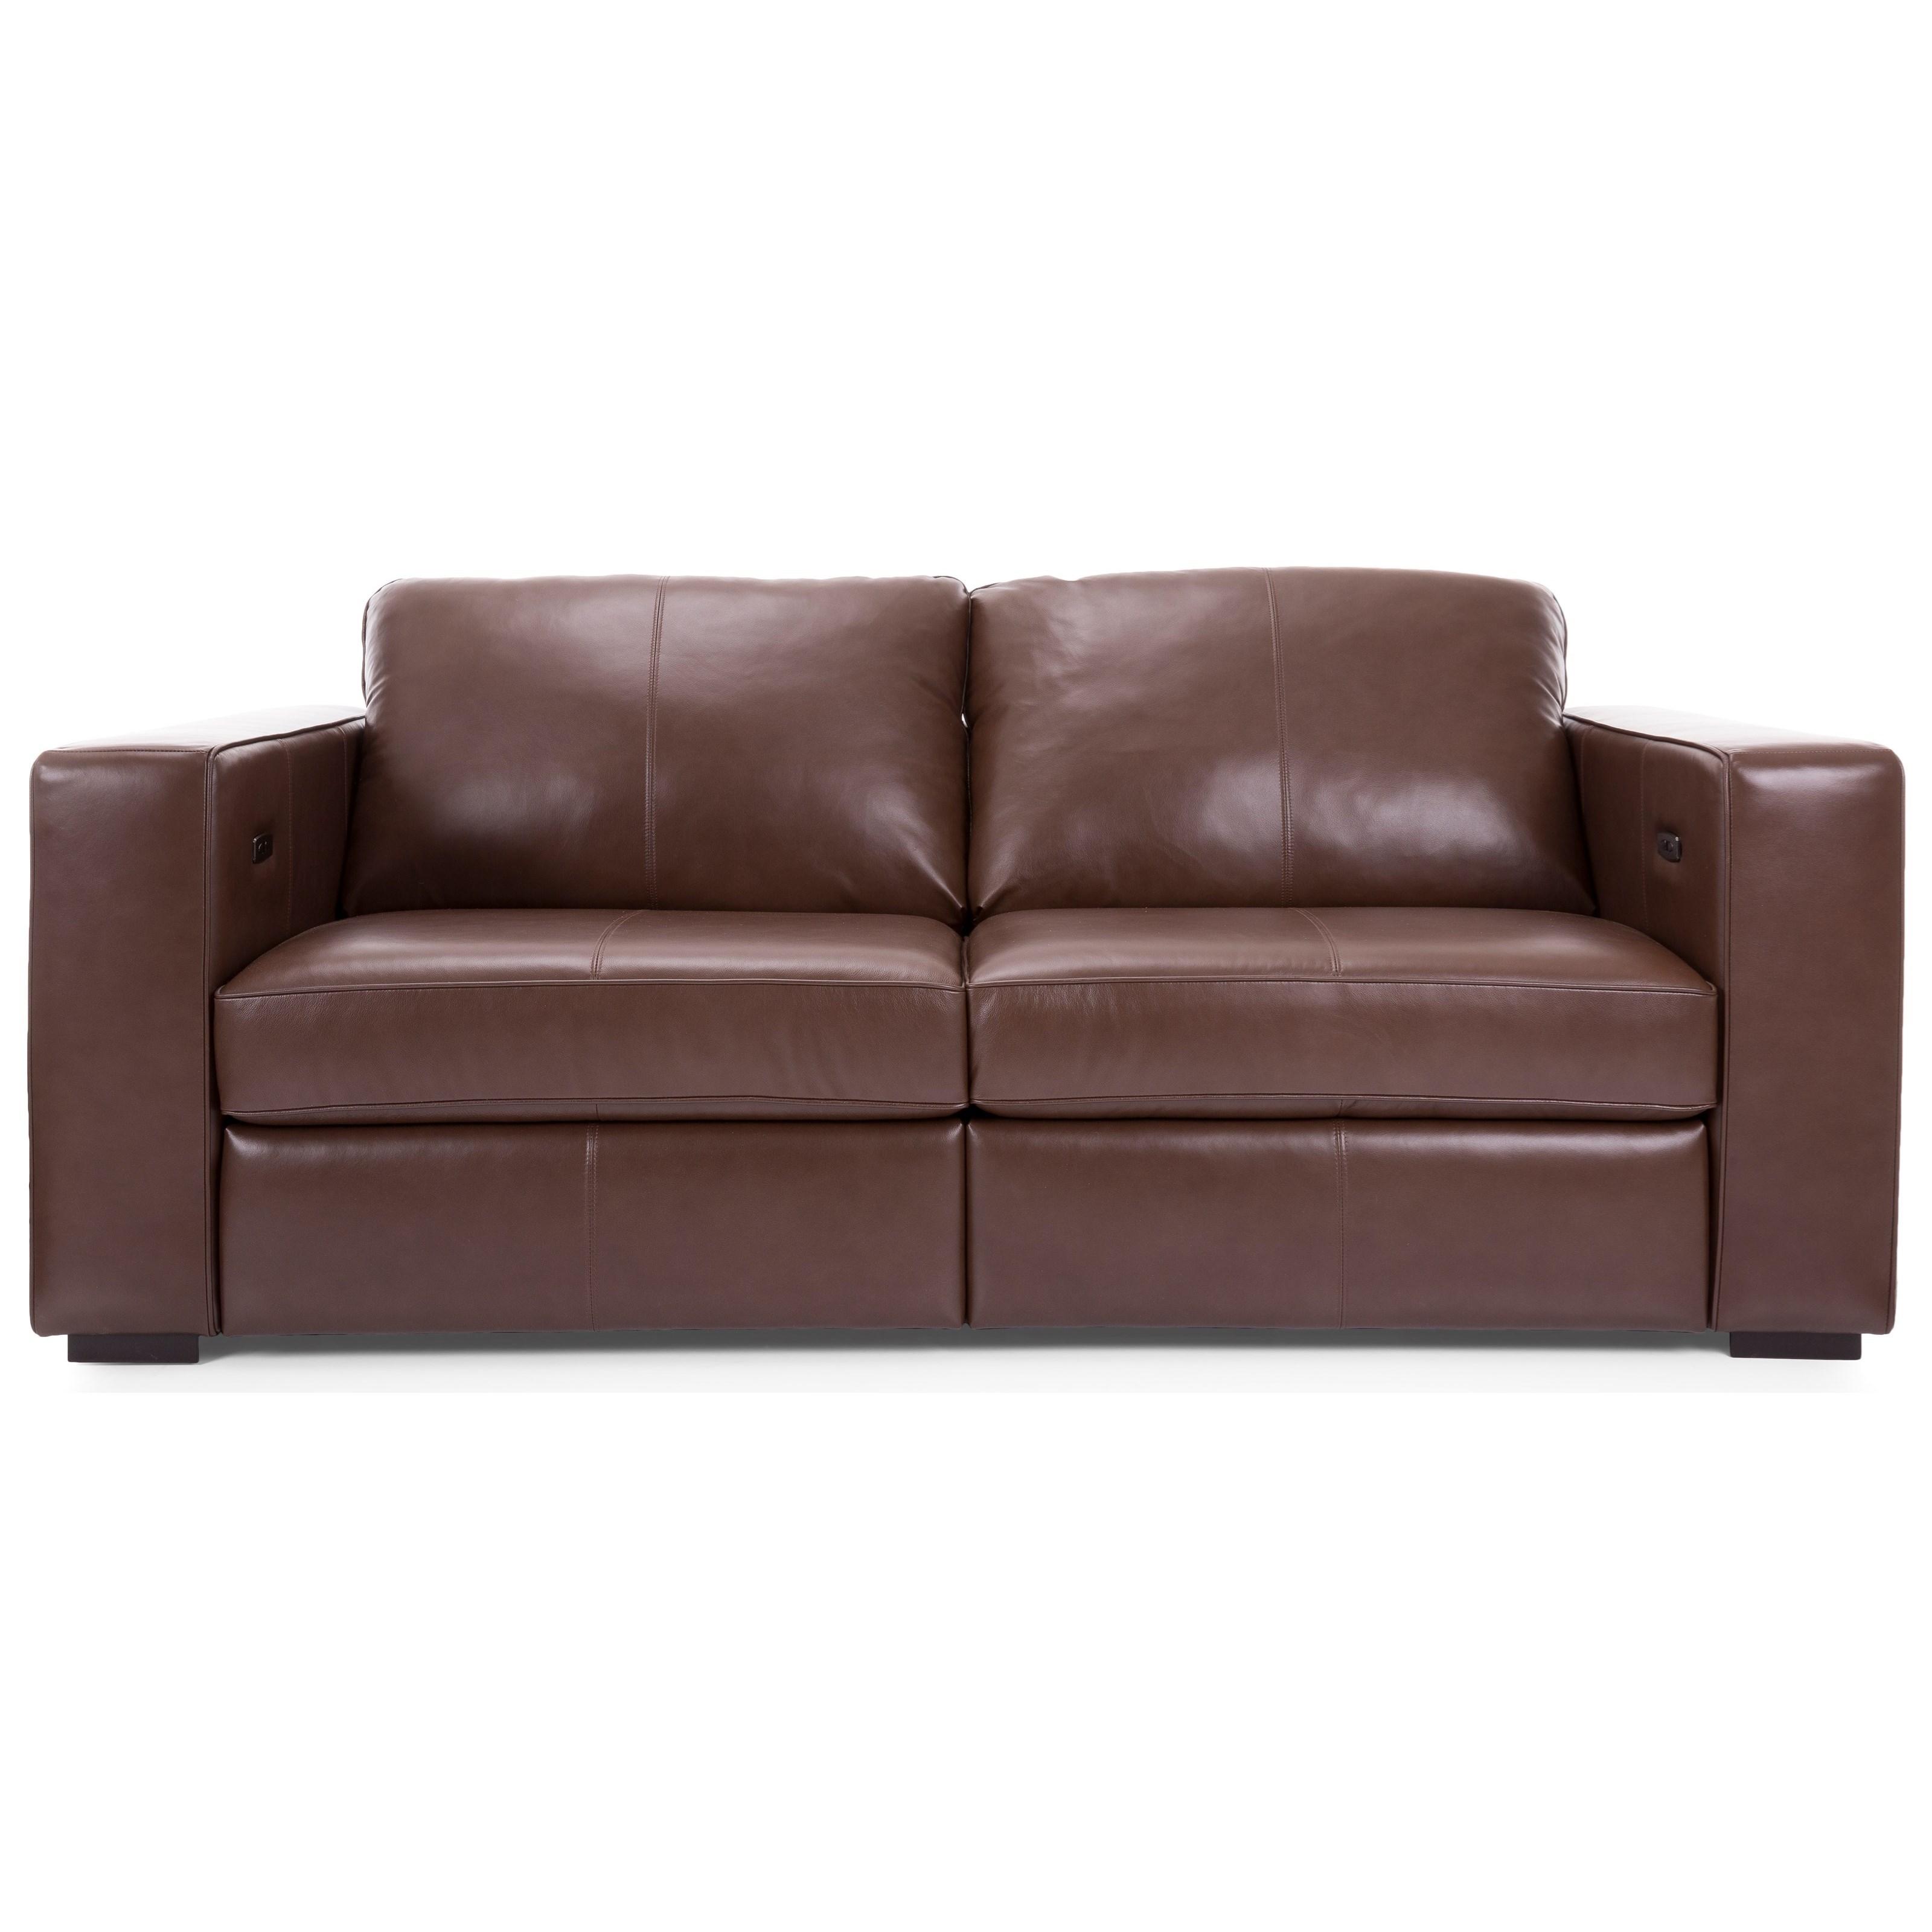 2900 Power Sofa by Decor-Rest at Johnny Janosik